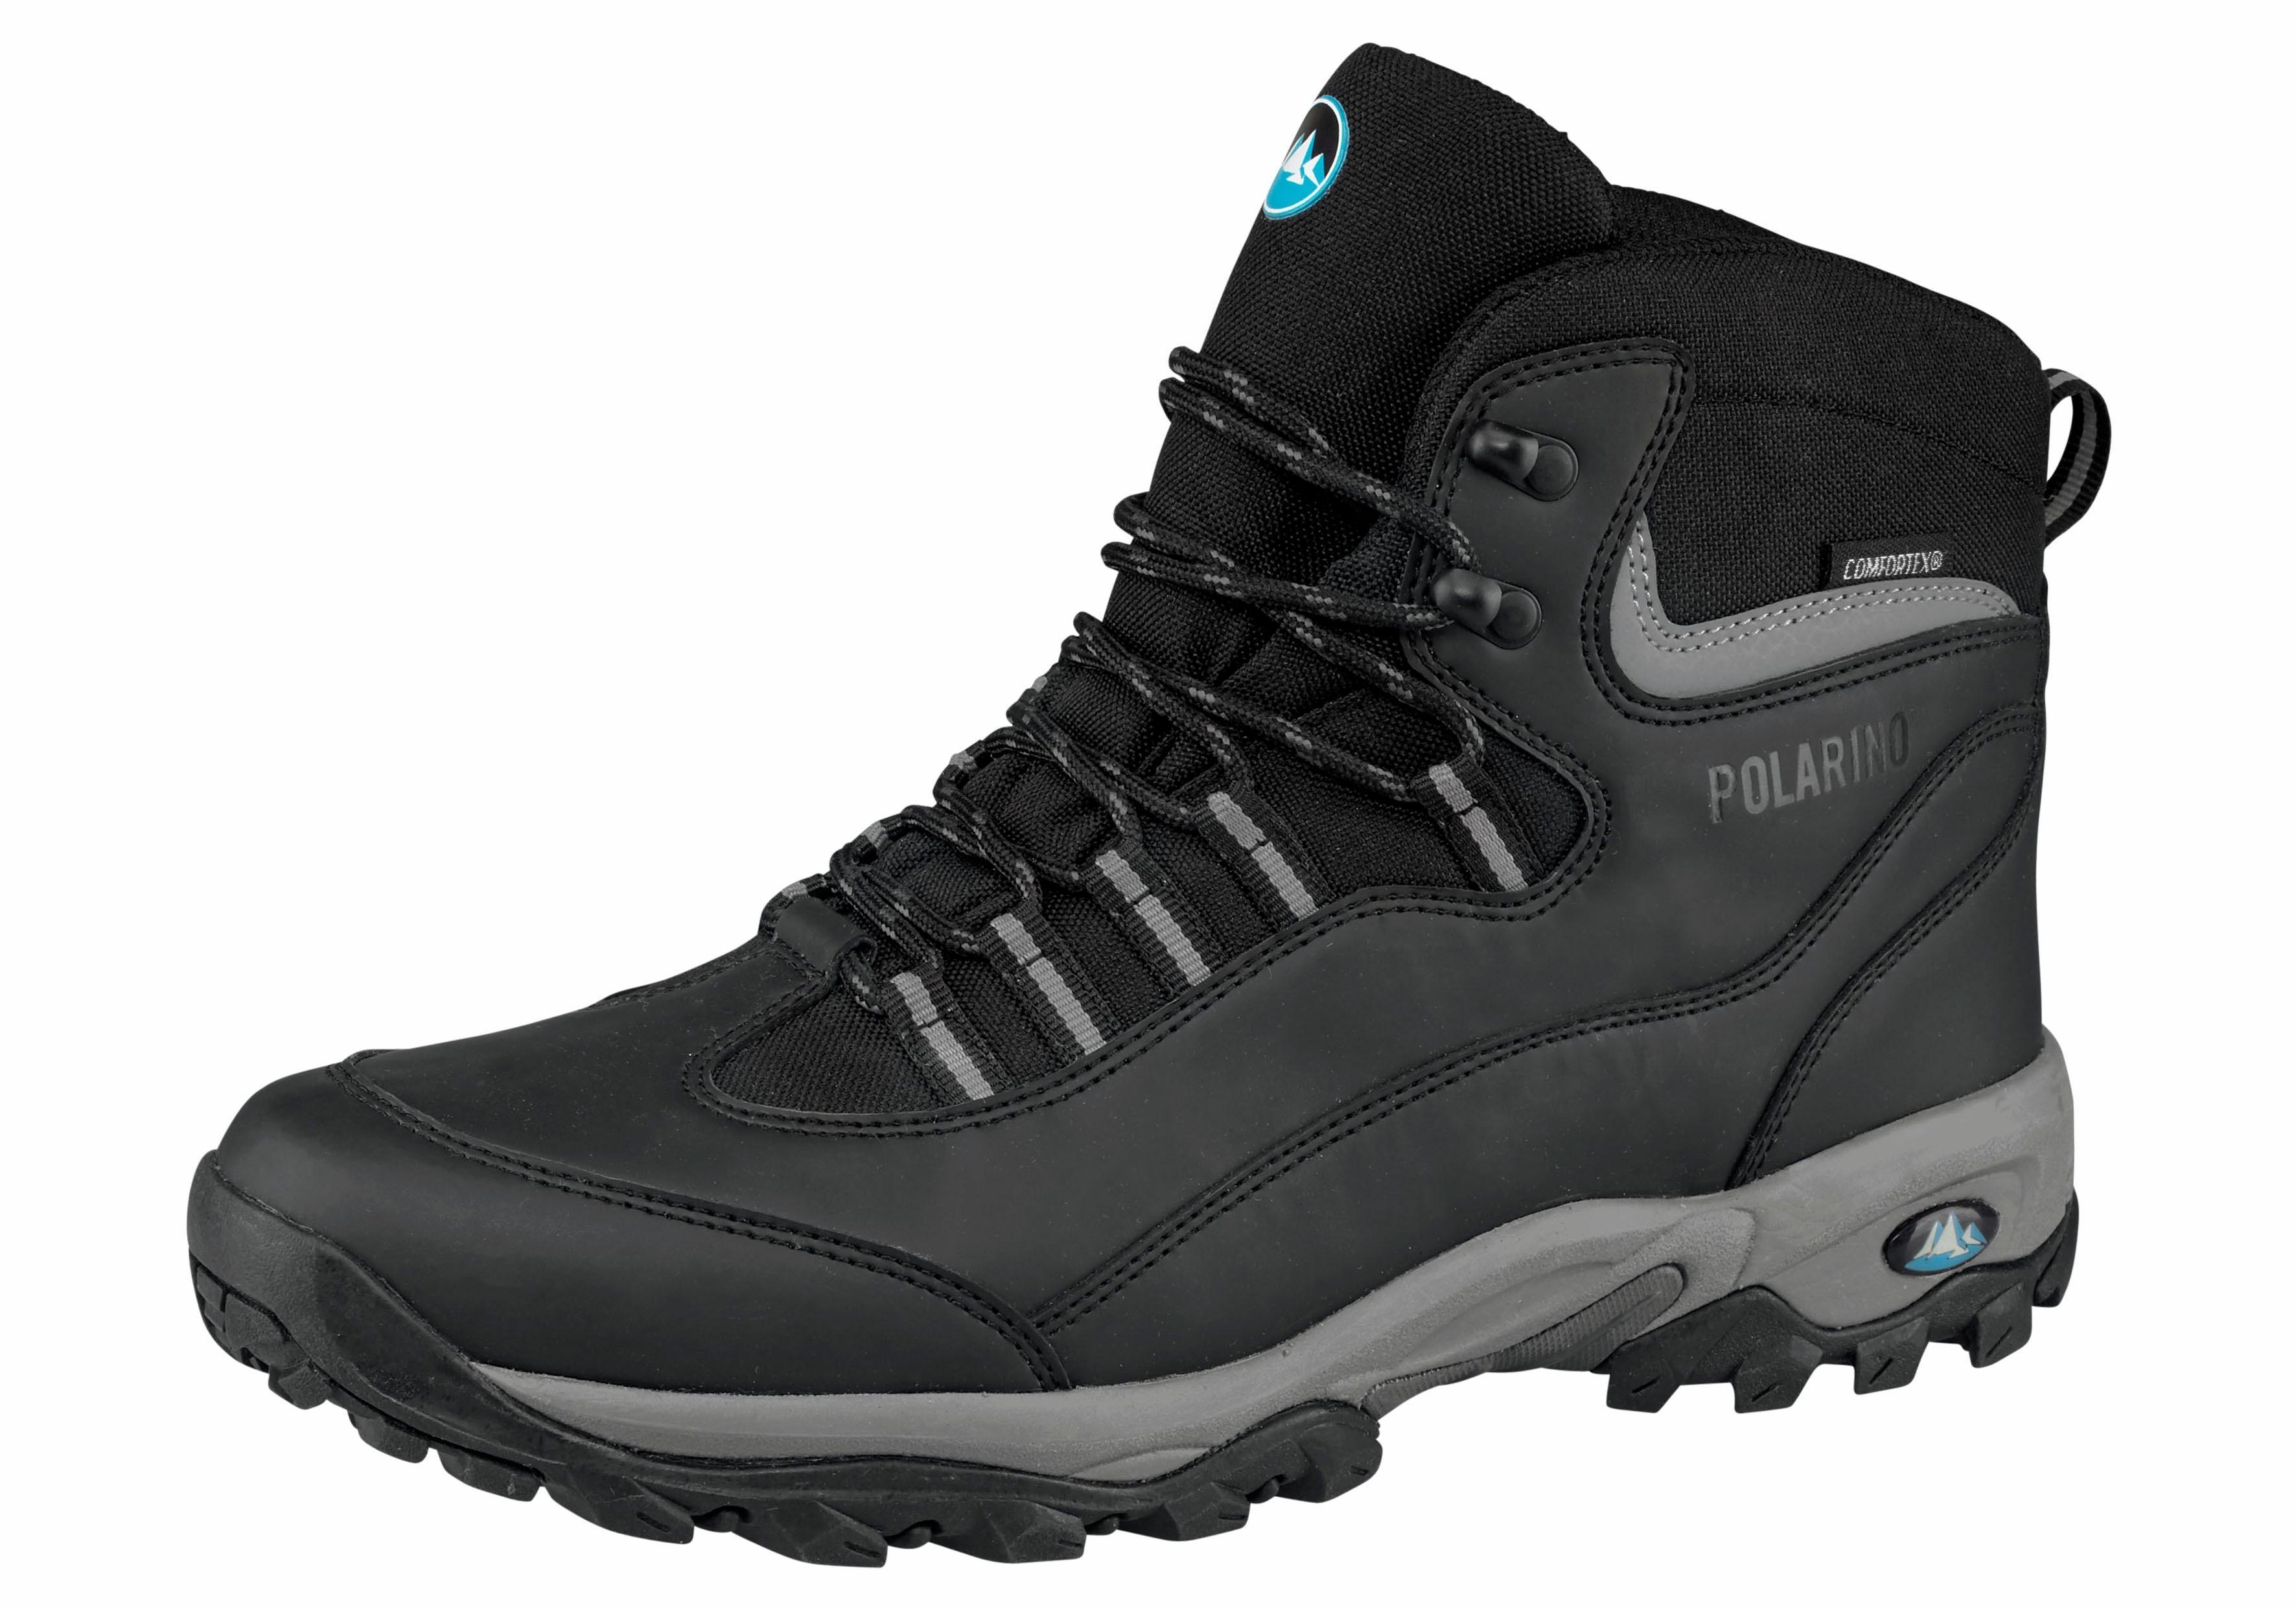 Polarino outdoorschoenen »Boots Canada« bij OTTO online kopen